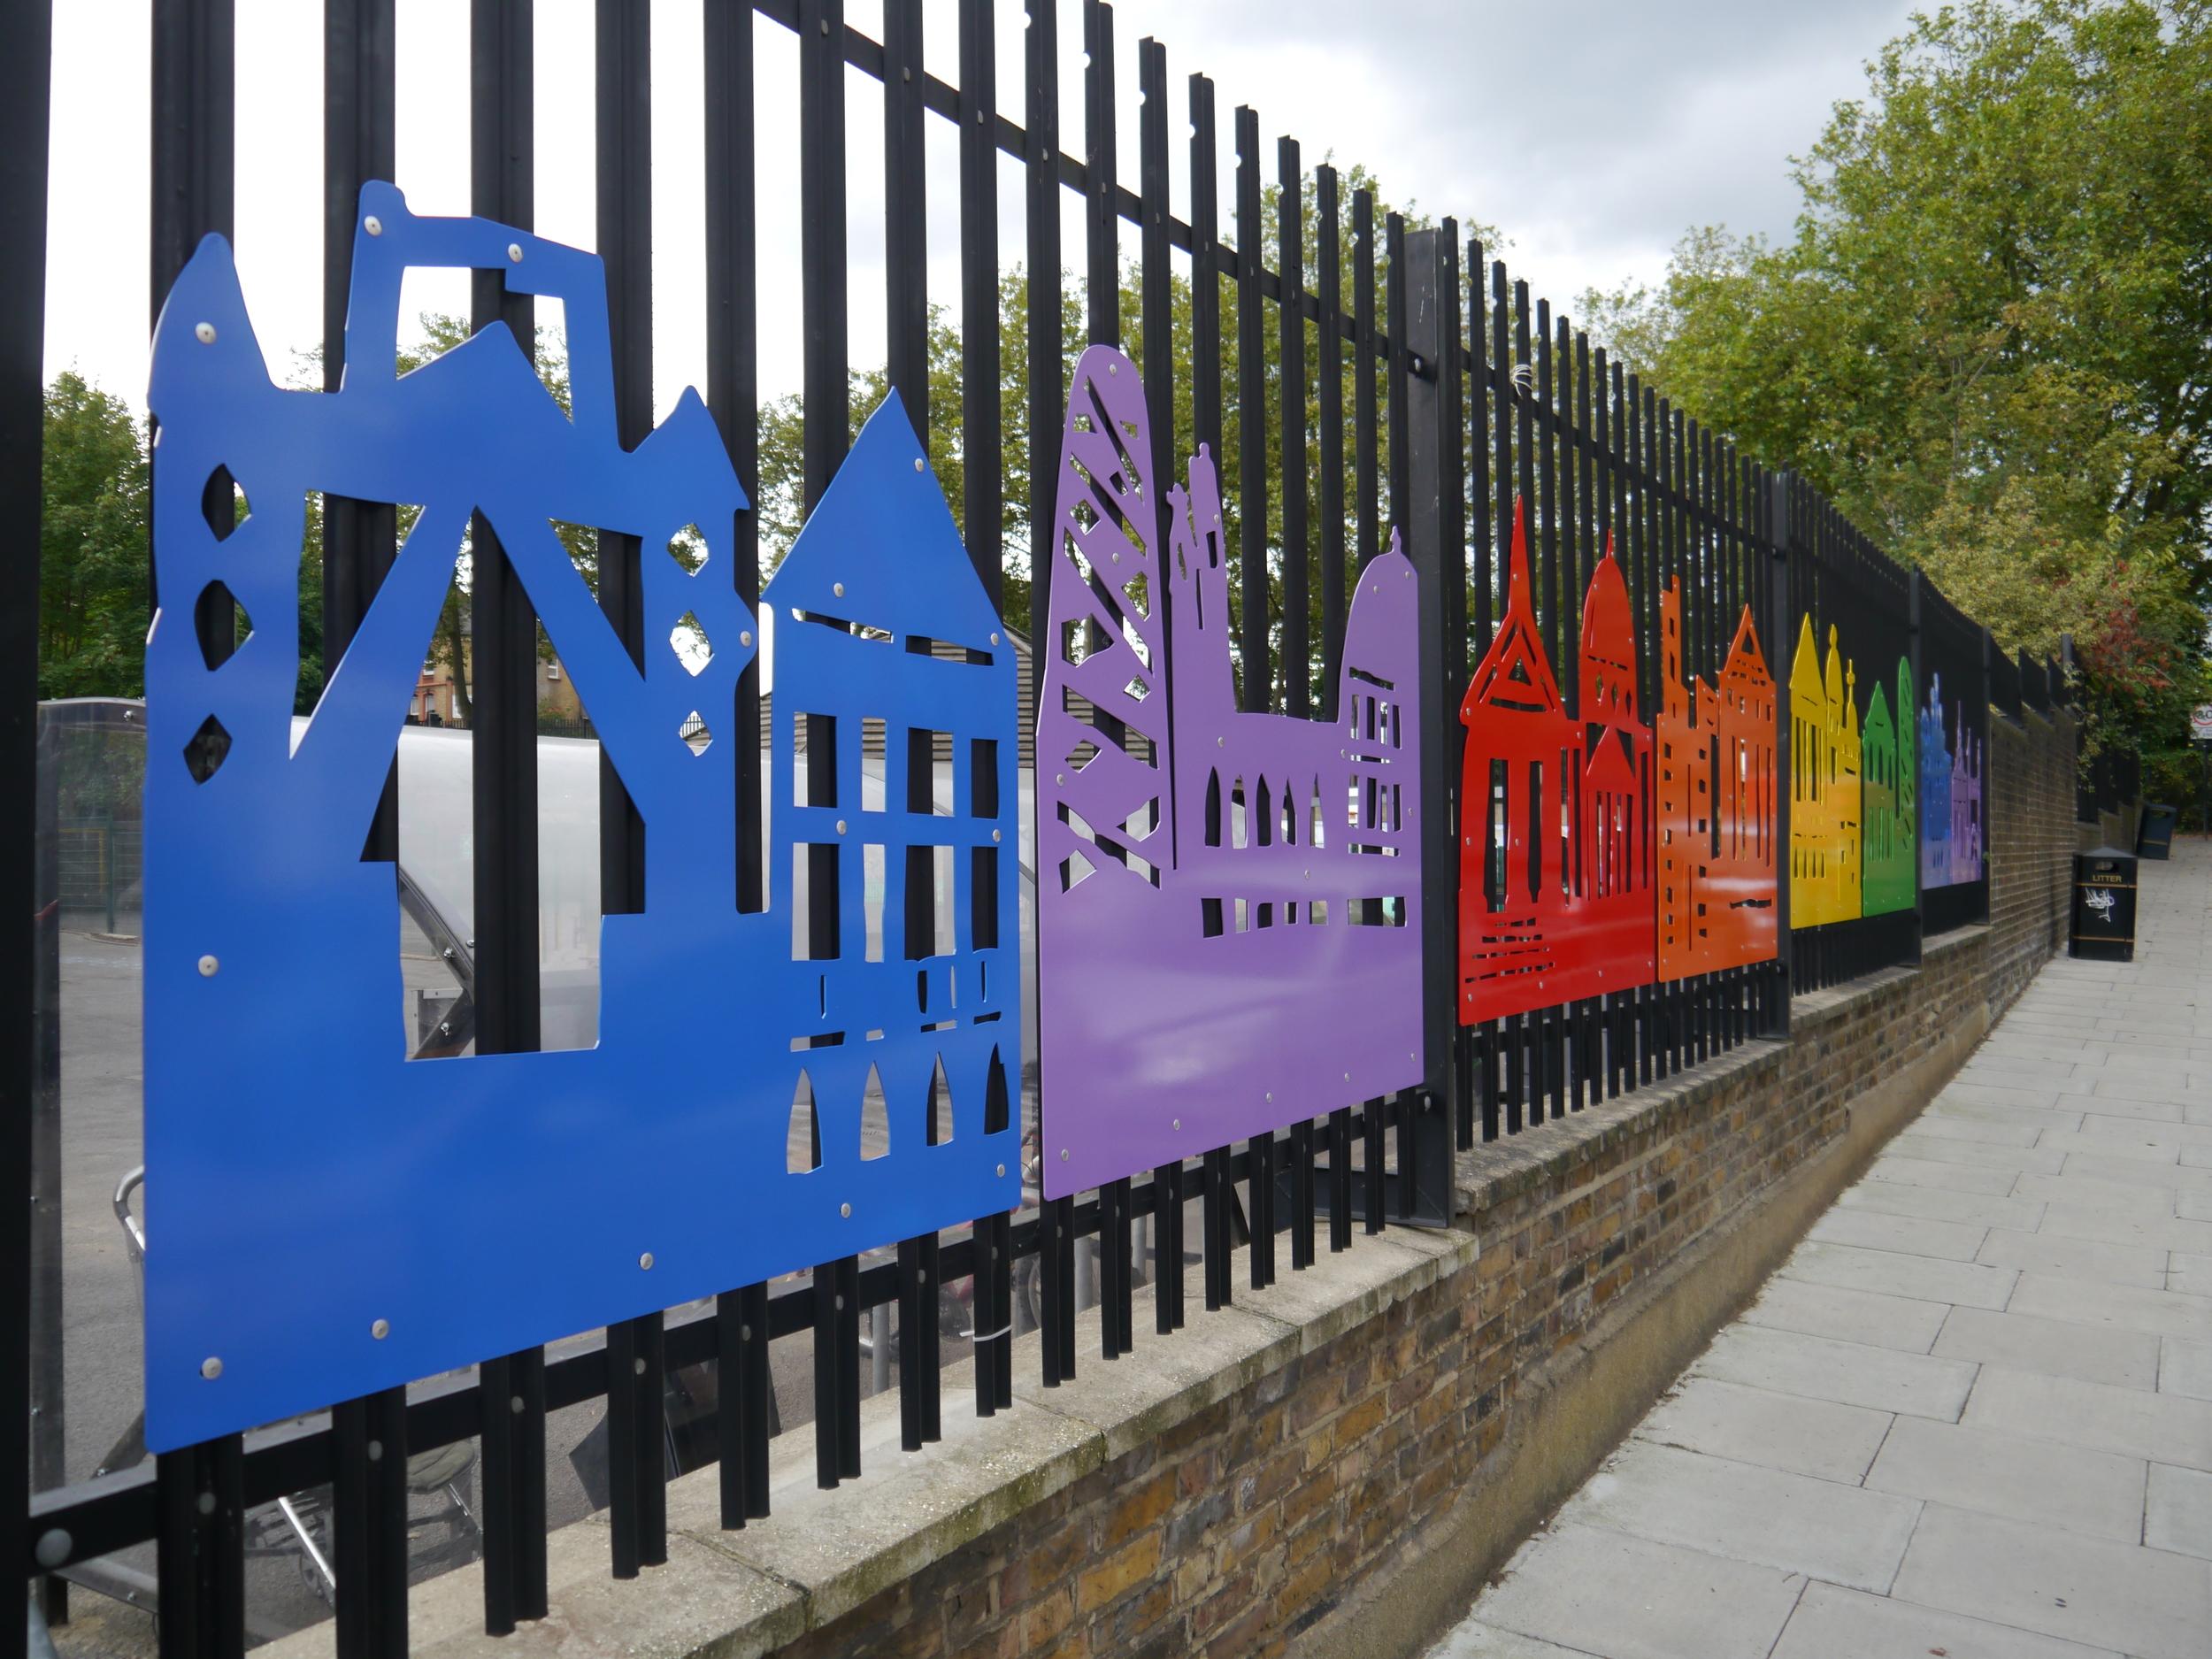 Large rainbow panels